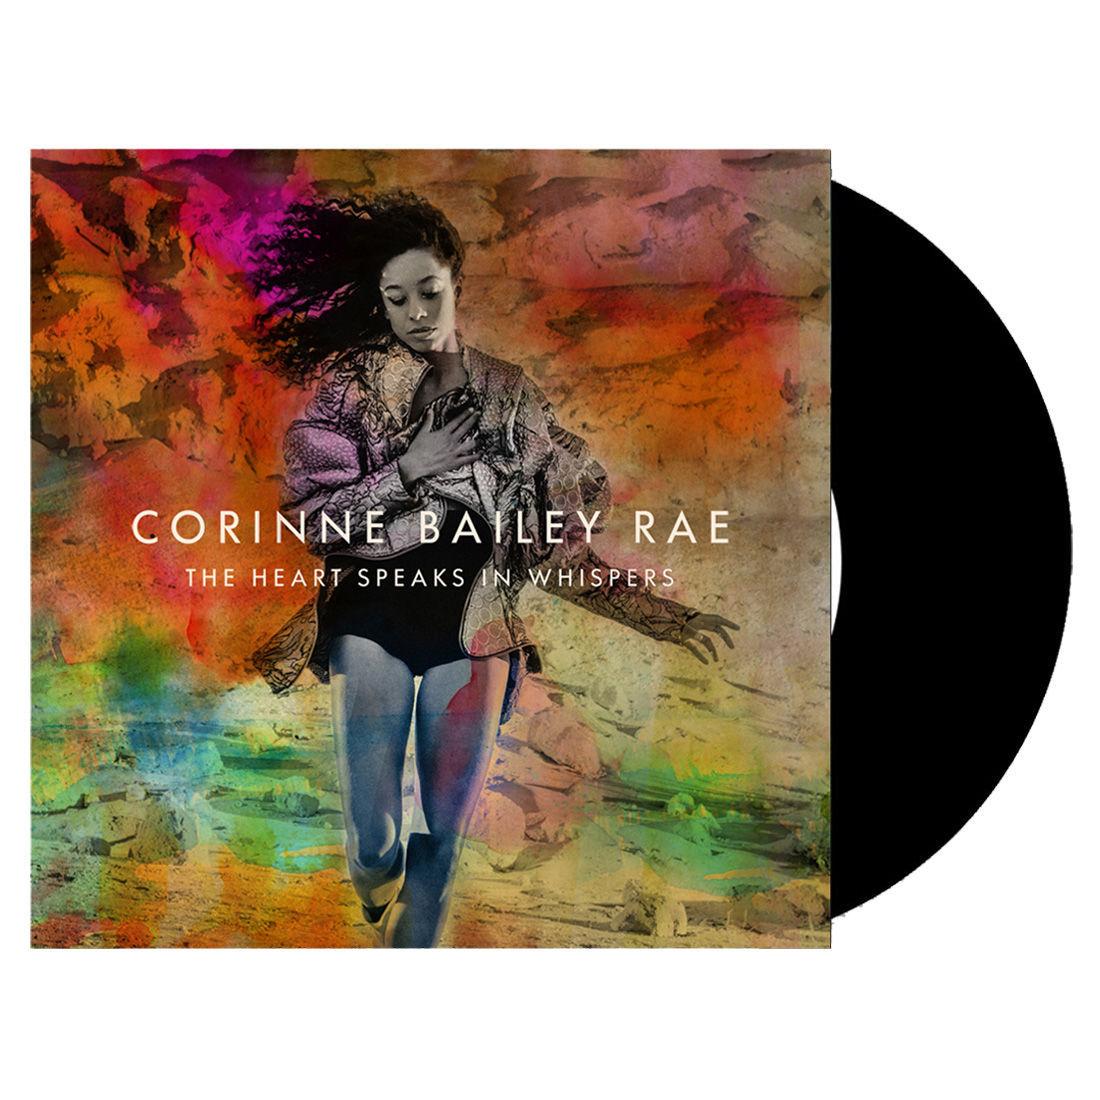 The Heart Speaks In Whispers Gate-fold Double Vinyl LP